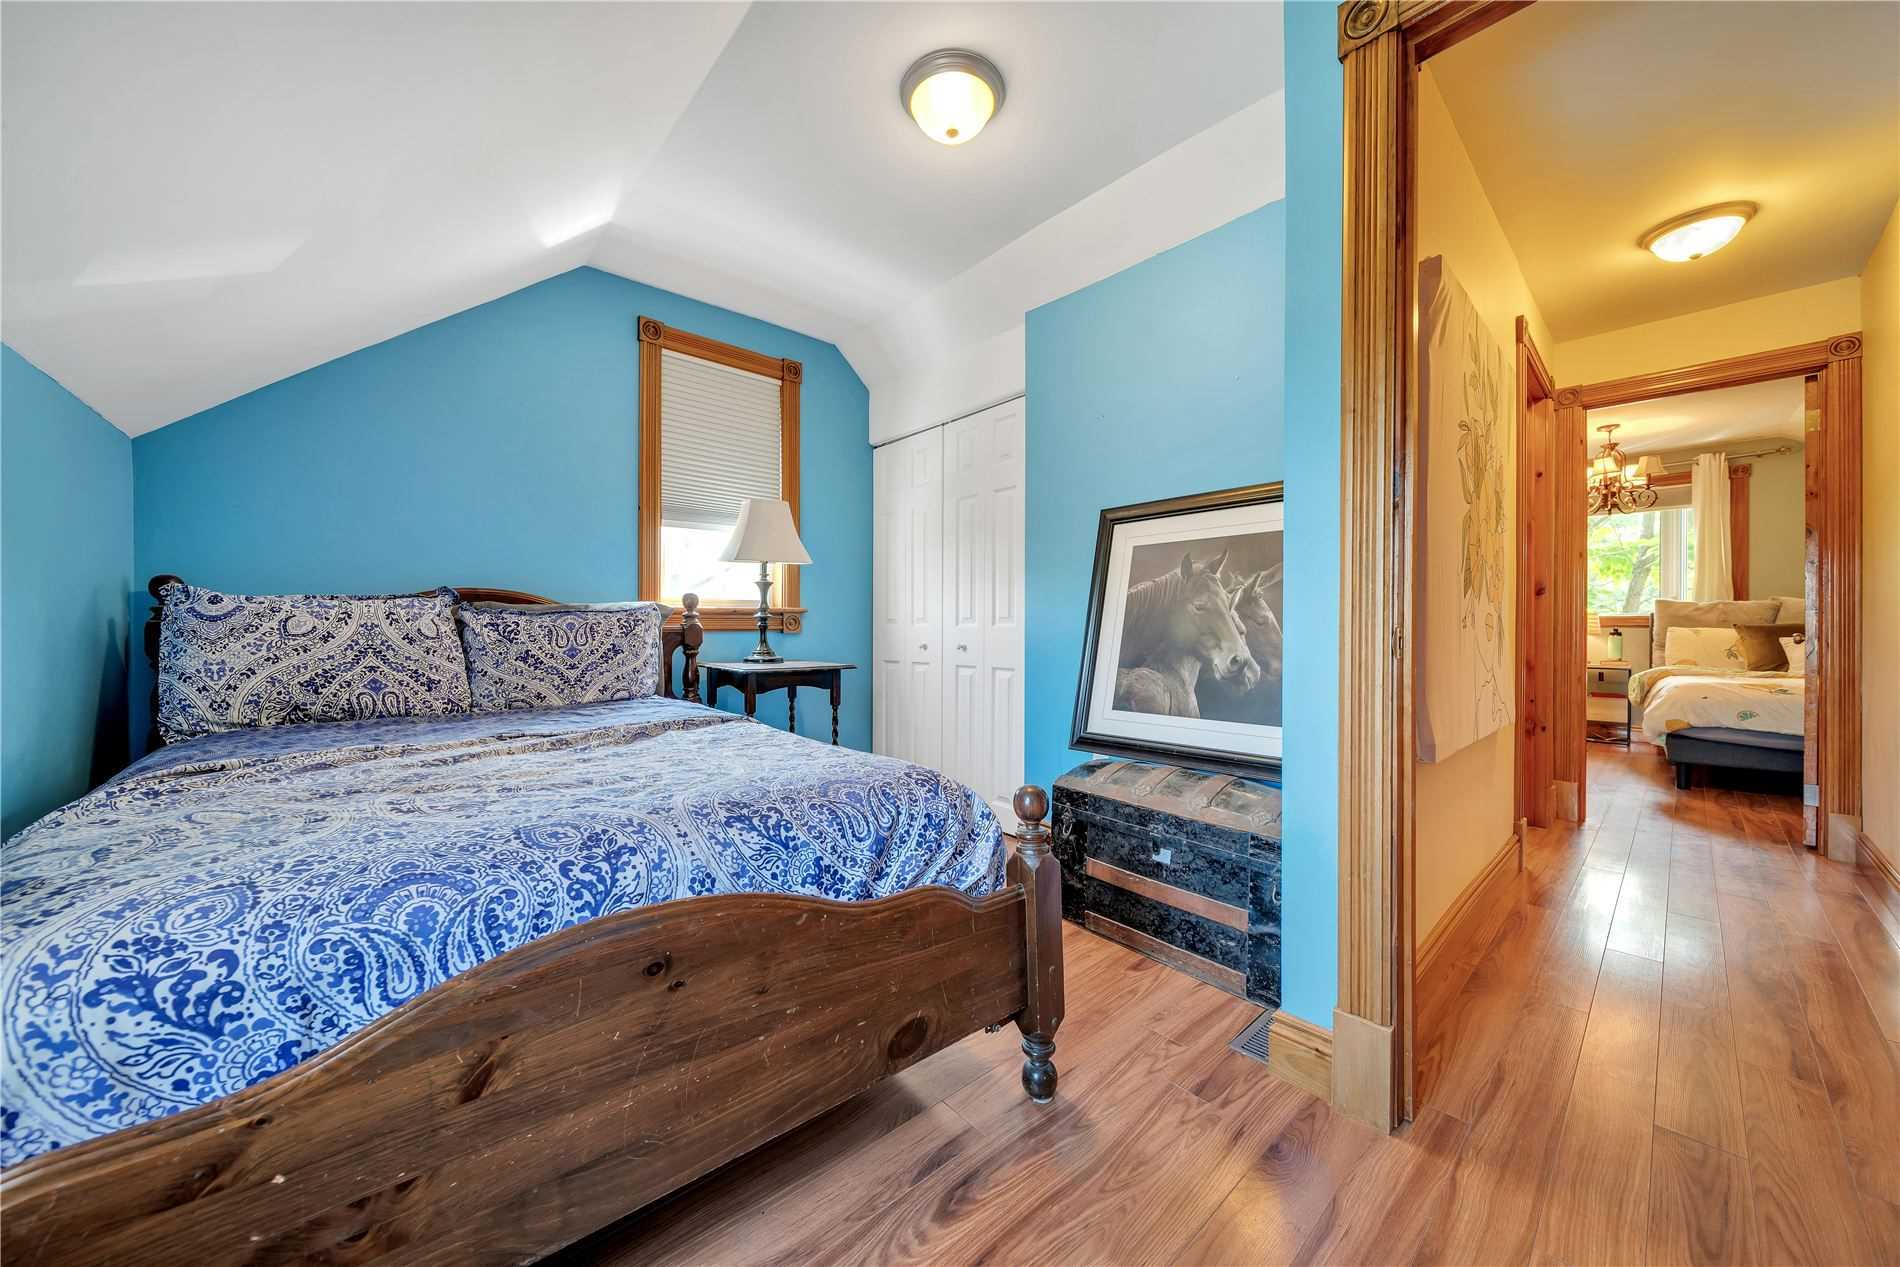 5356 Harwood Rd, Hamilton Township, Ontario K0K2H0, 4 Bedrooms Bedrooms, 13 Rooms Rooms,2 BathroomsBathrooms,Detached,For Sale,Harwood,X5330332